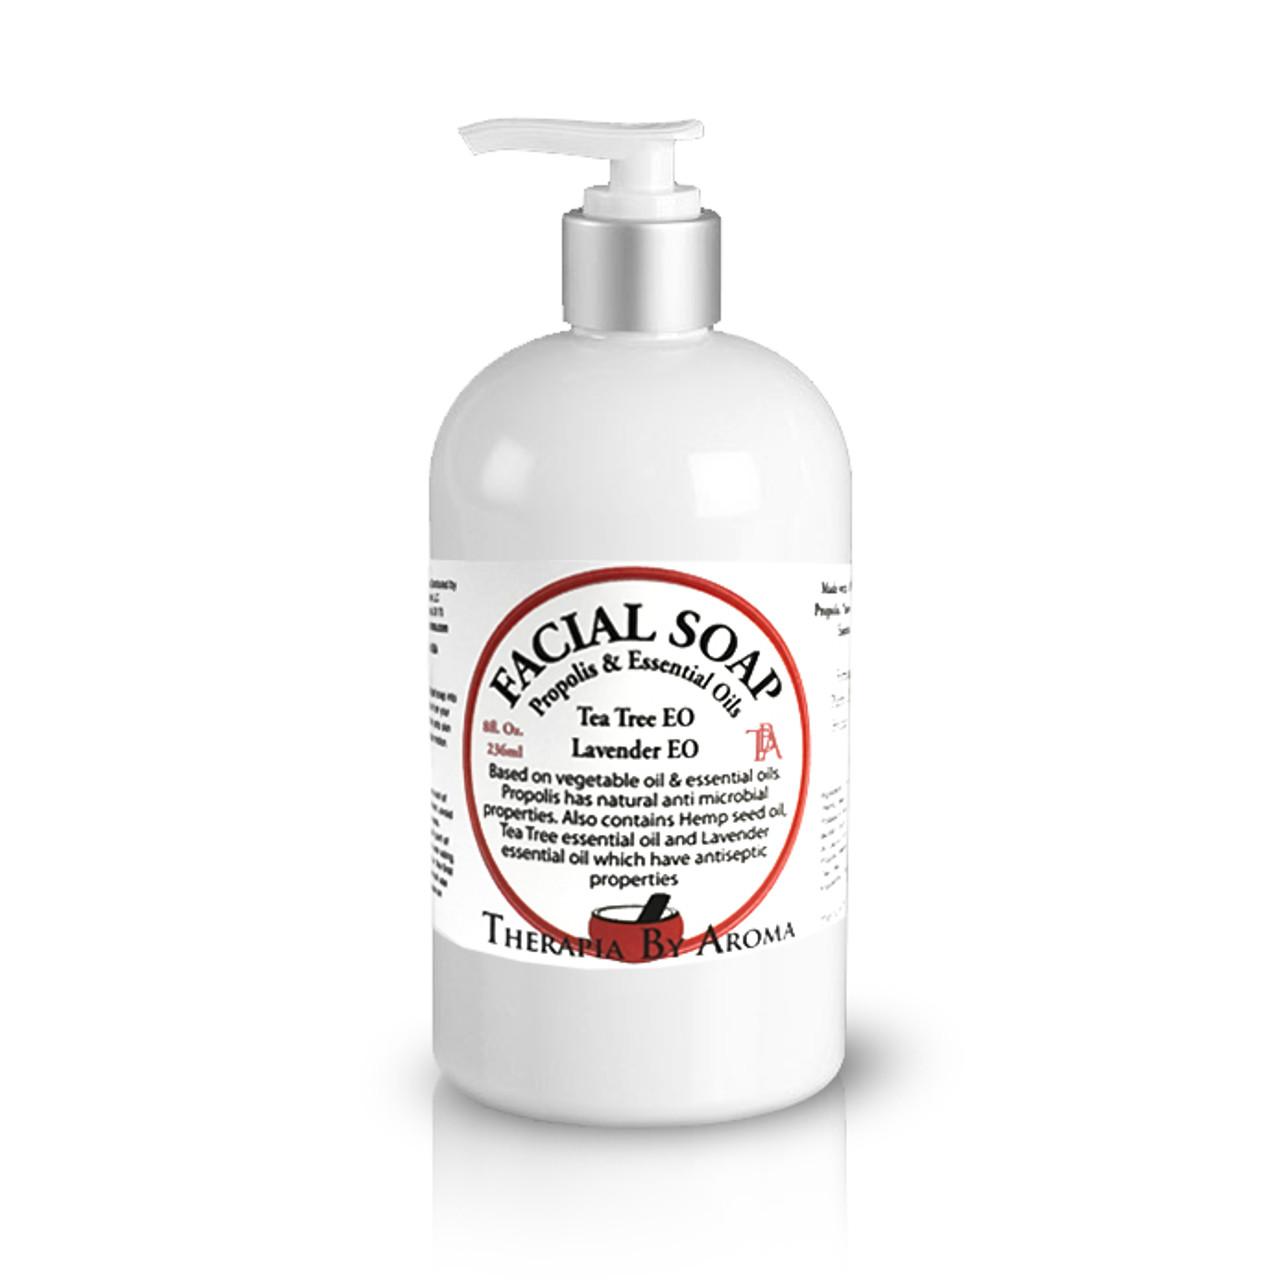 Facial Soap Propolis - with Tea tree & Lavender essential oils